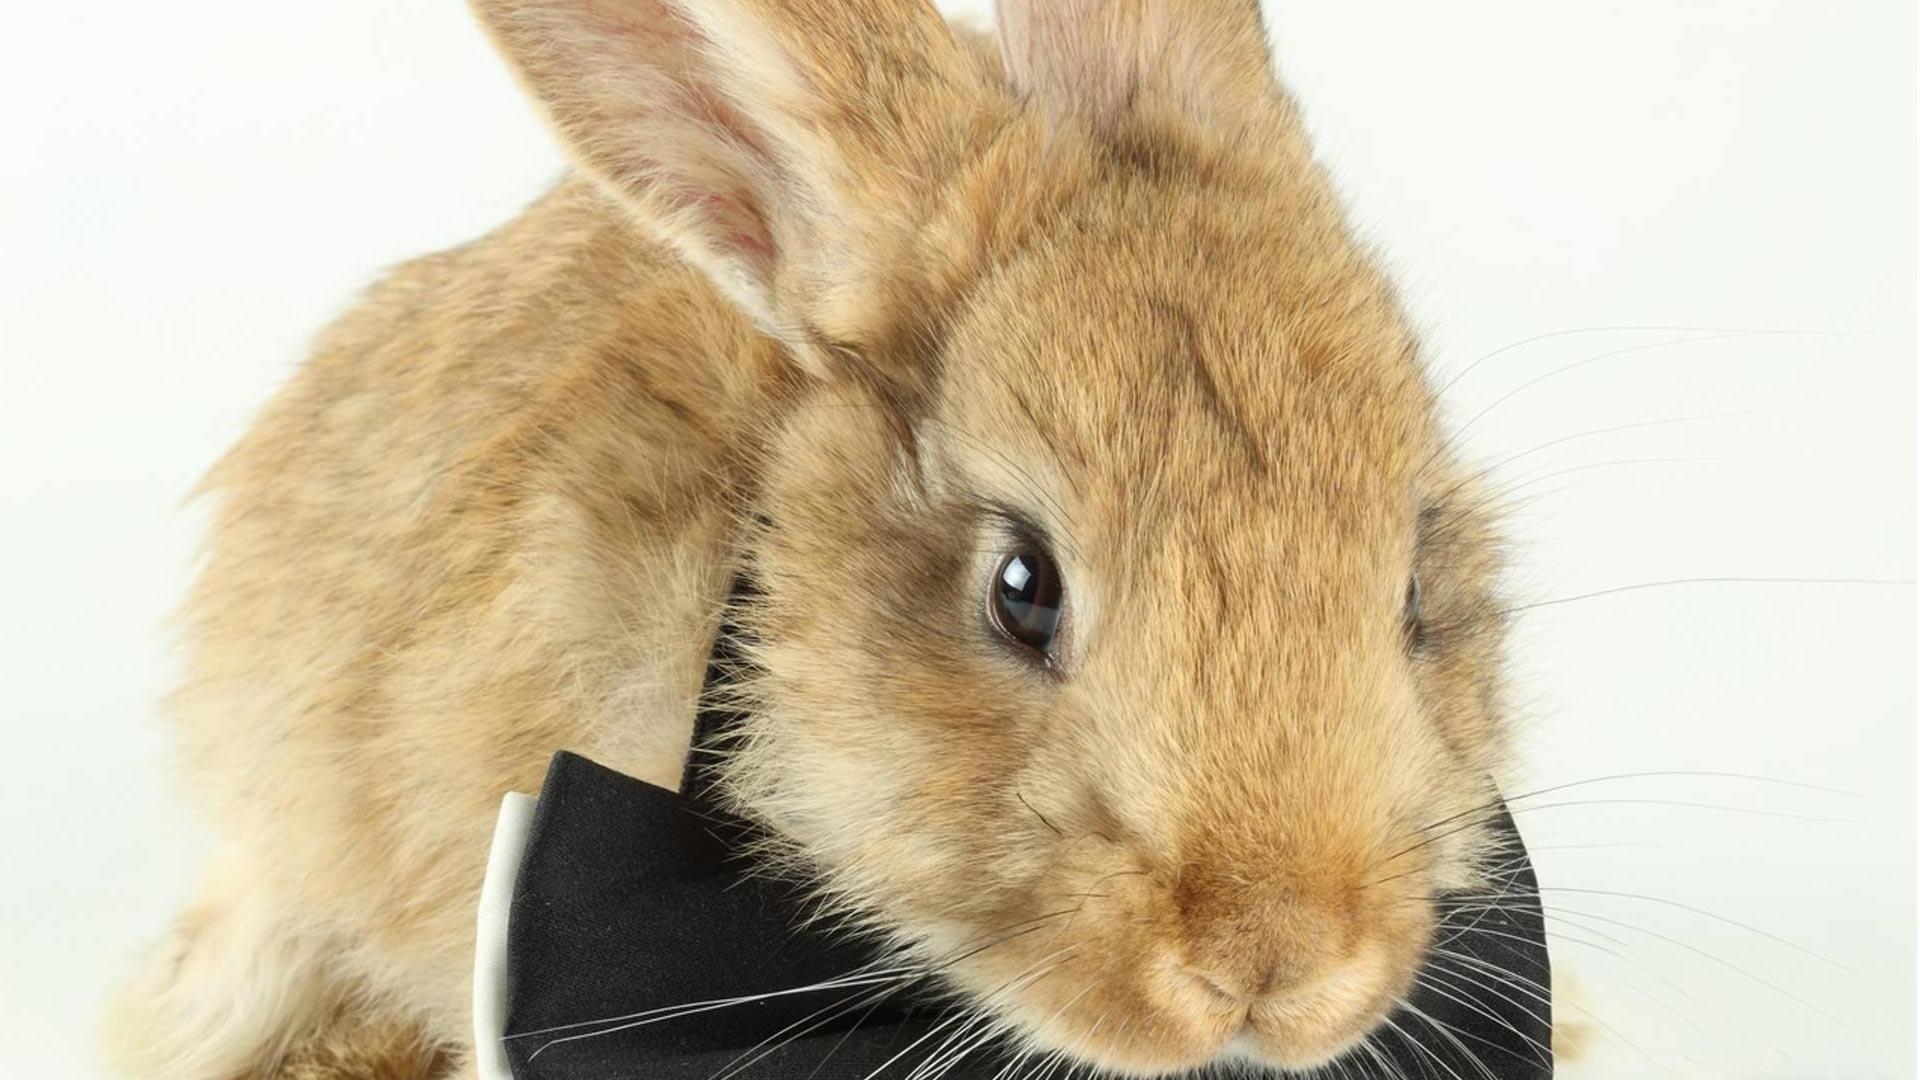 Download wallpaper 1920x1080 playboy logo bunny symbol full hd playboy x gta 4 grand theft auto 4 bunny bow hair voltagebd Image collections